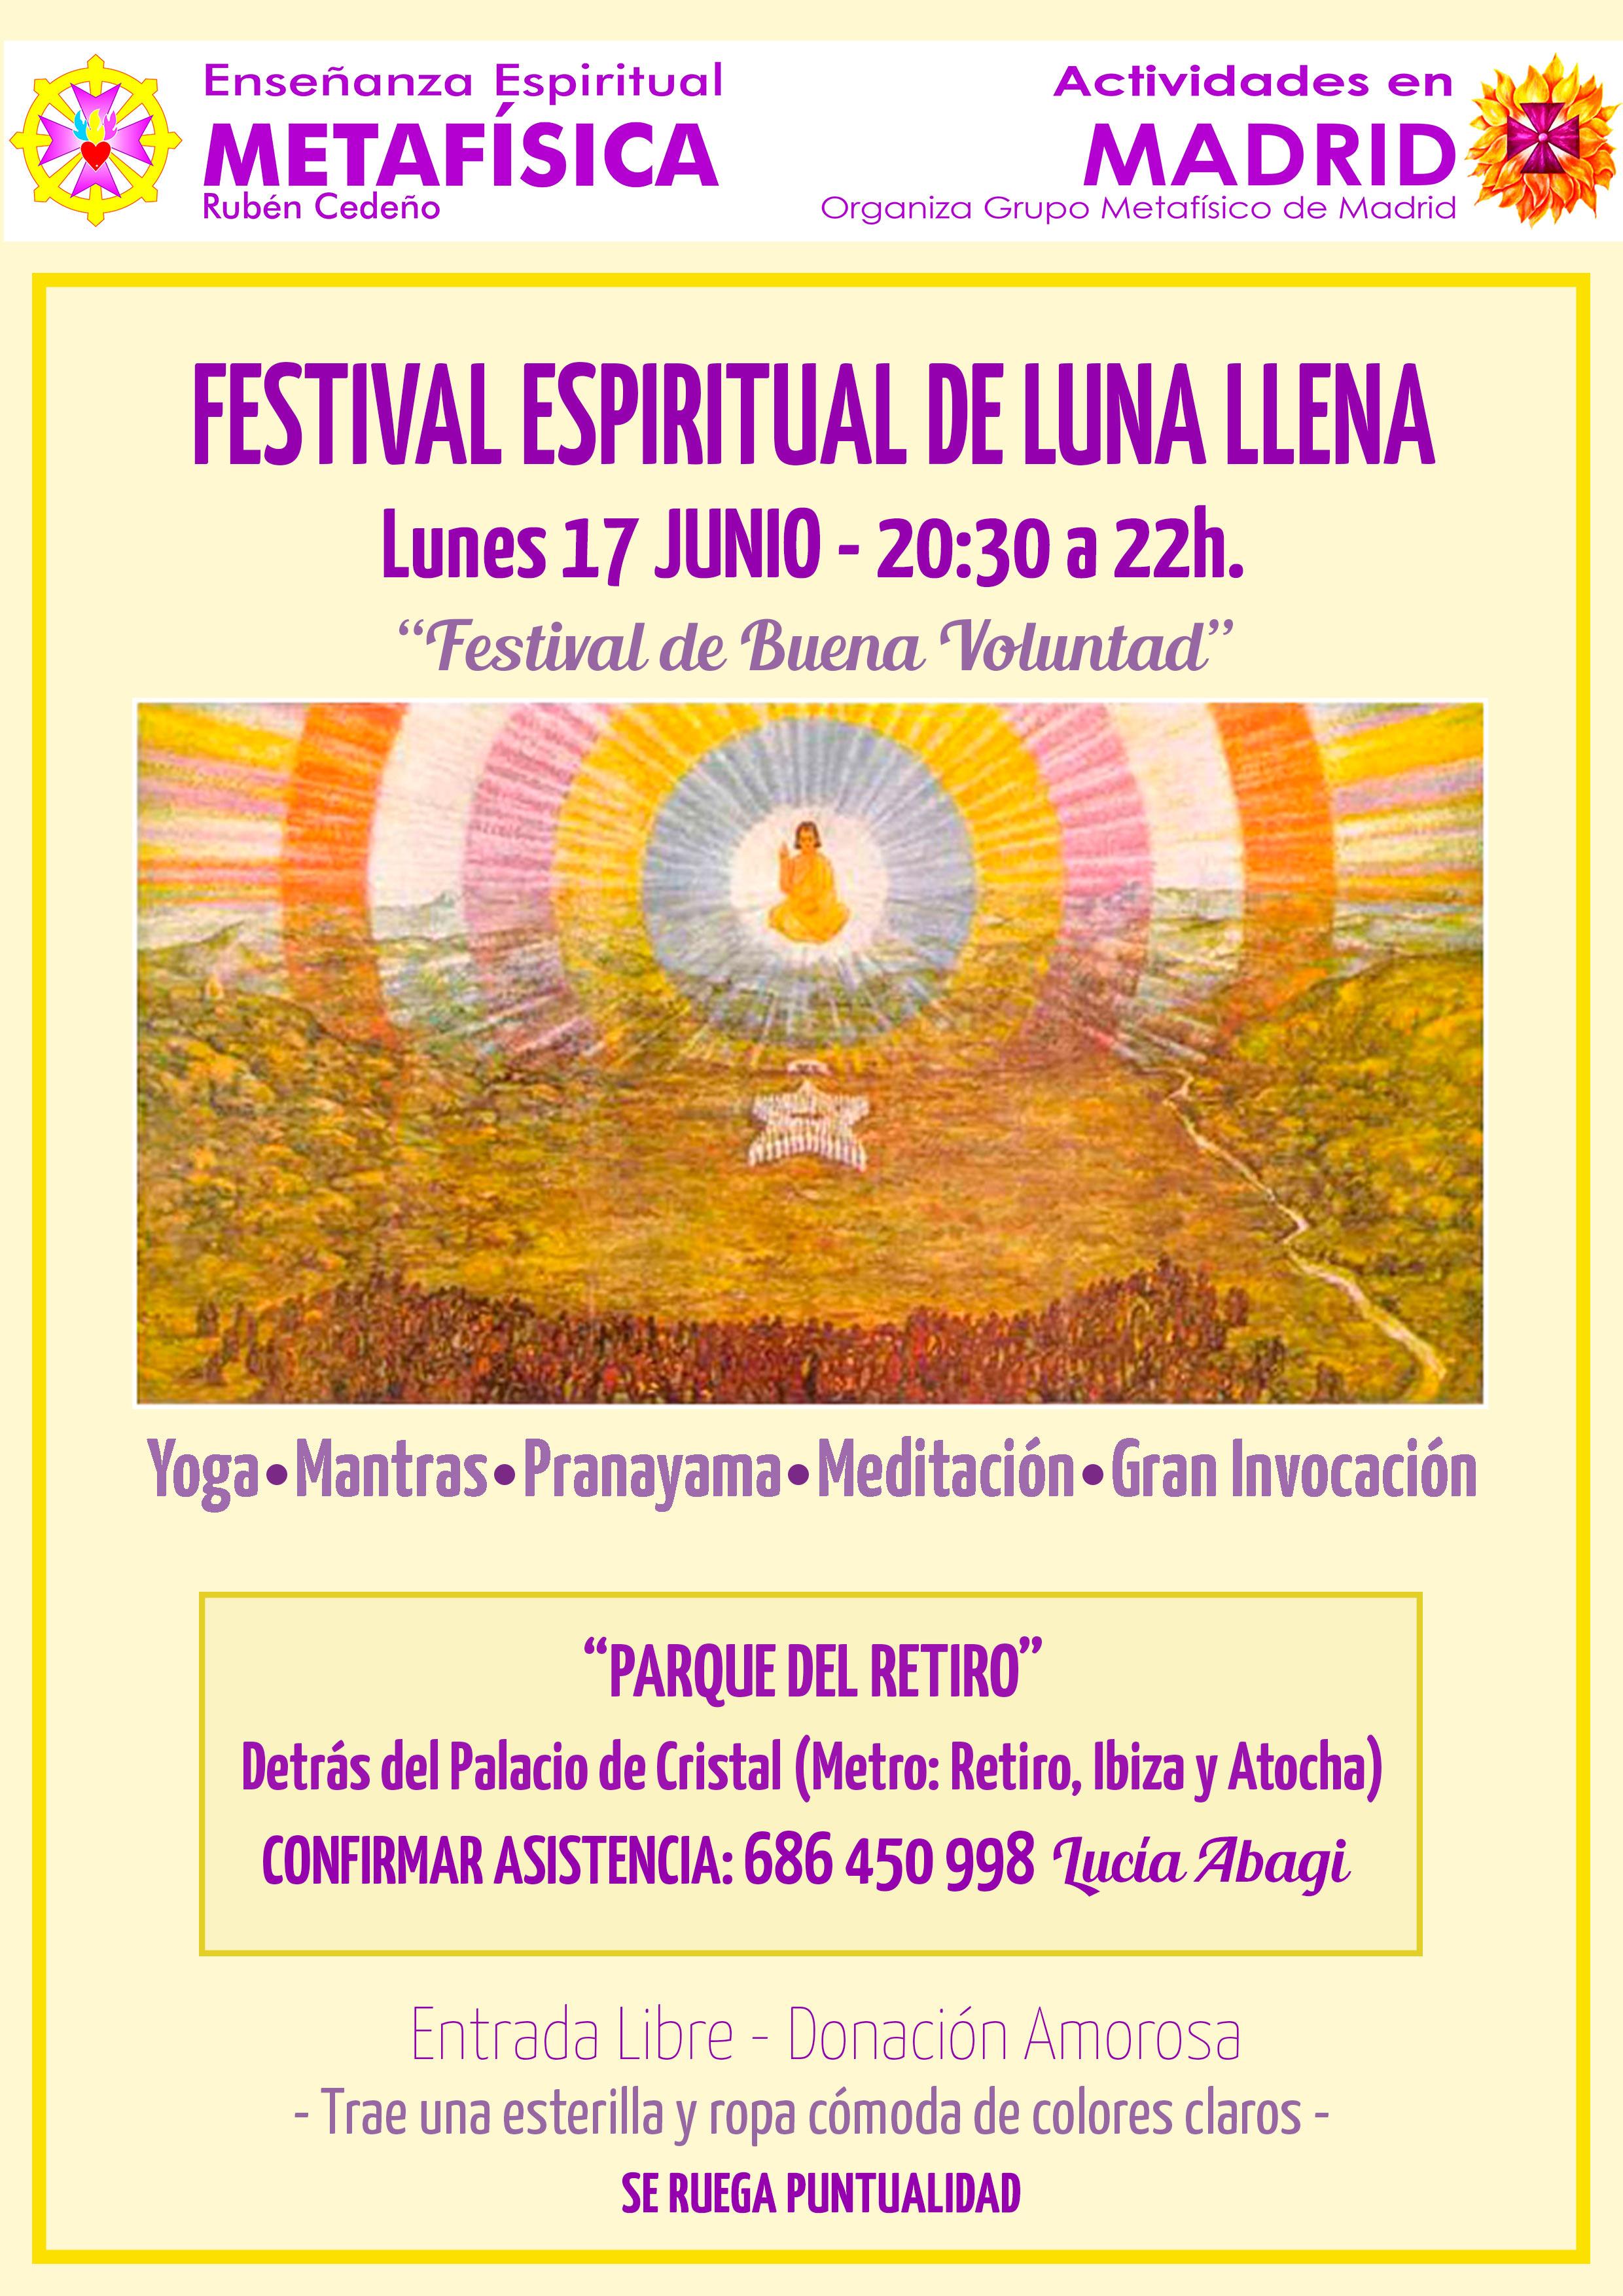 Festival Espiritual de Luna Llena en el Parque del Retiro (Madrid)